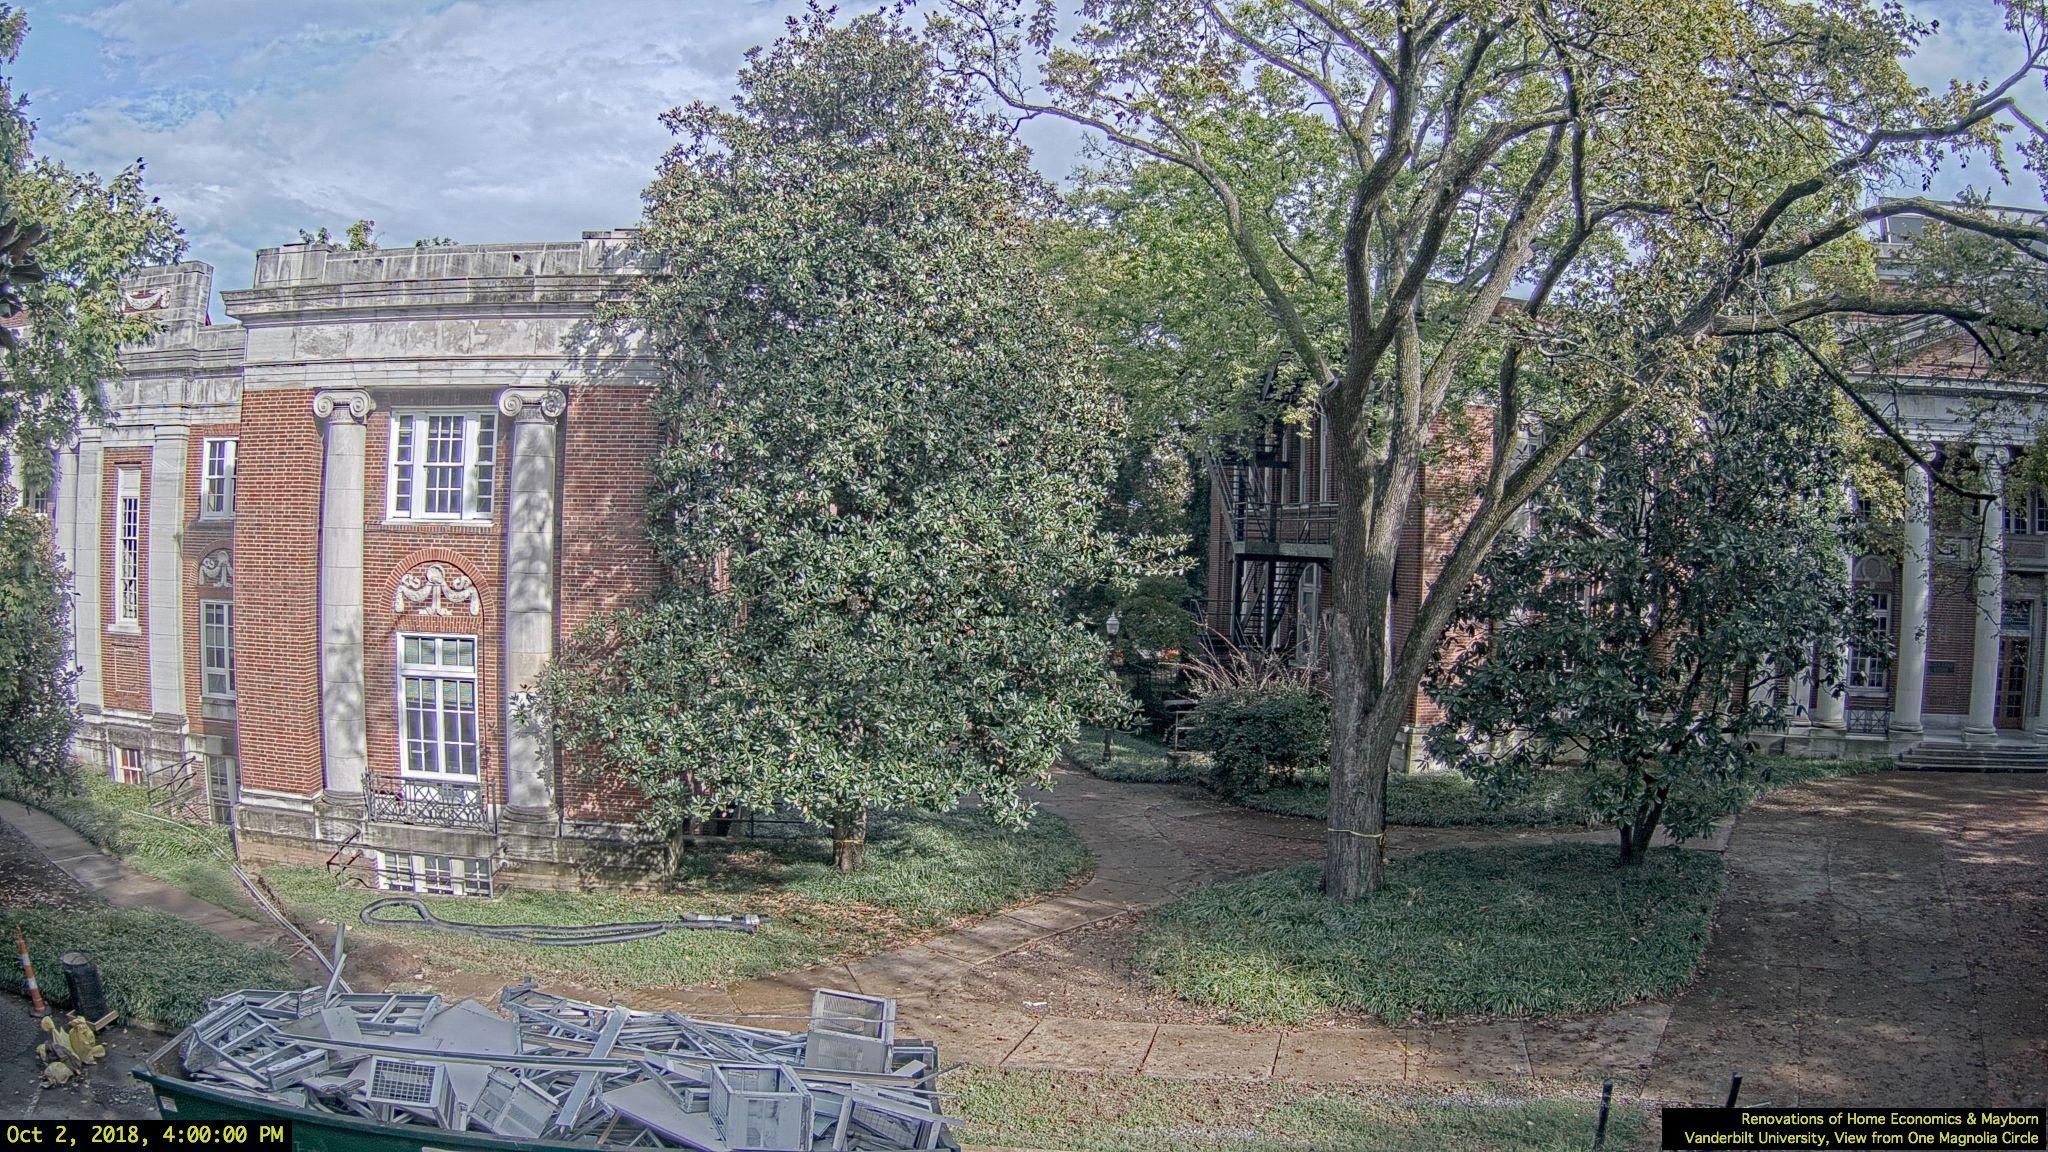 Renovations of Home Economics & Mayborn, Peabody College, Vanderbilt University